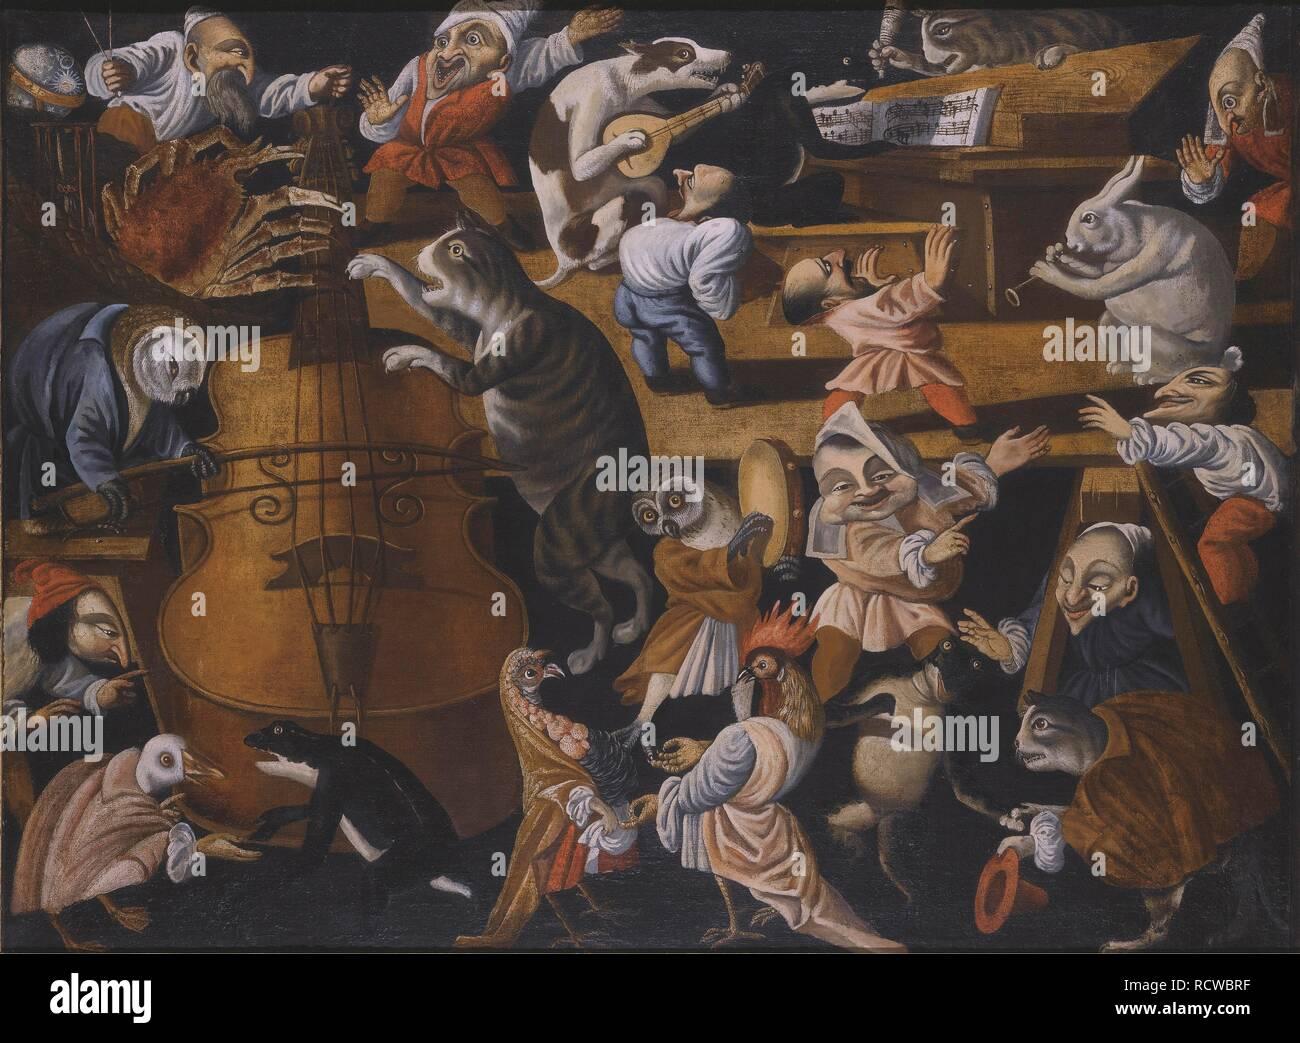 A concert of animals, birds and stylised figures. Museum: PRIVATE COLLECTION. Author: Maestro della Fertilità dell'Uovo. - Stock Image